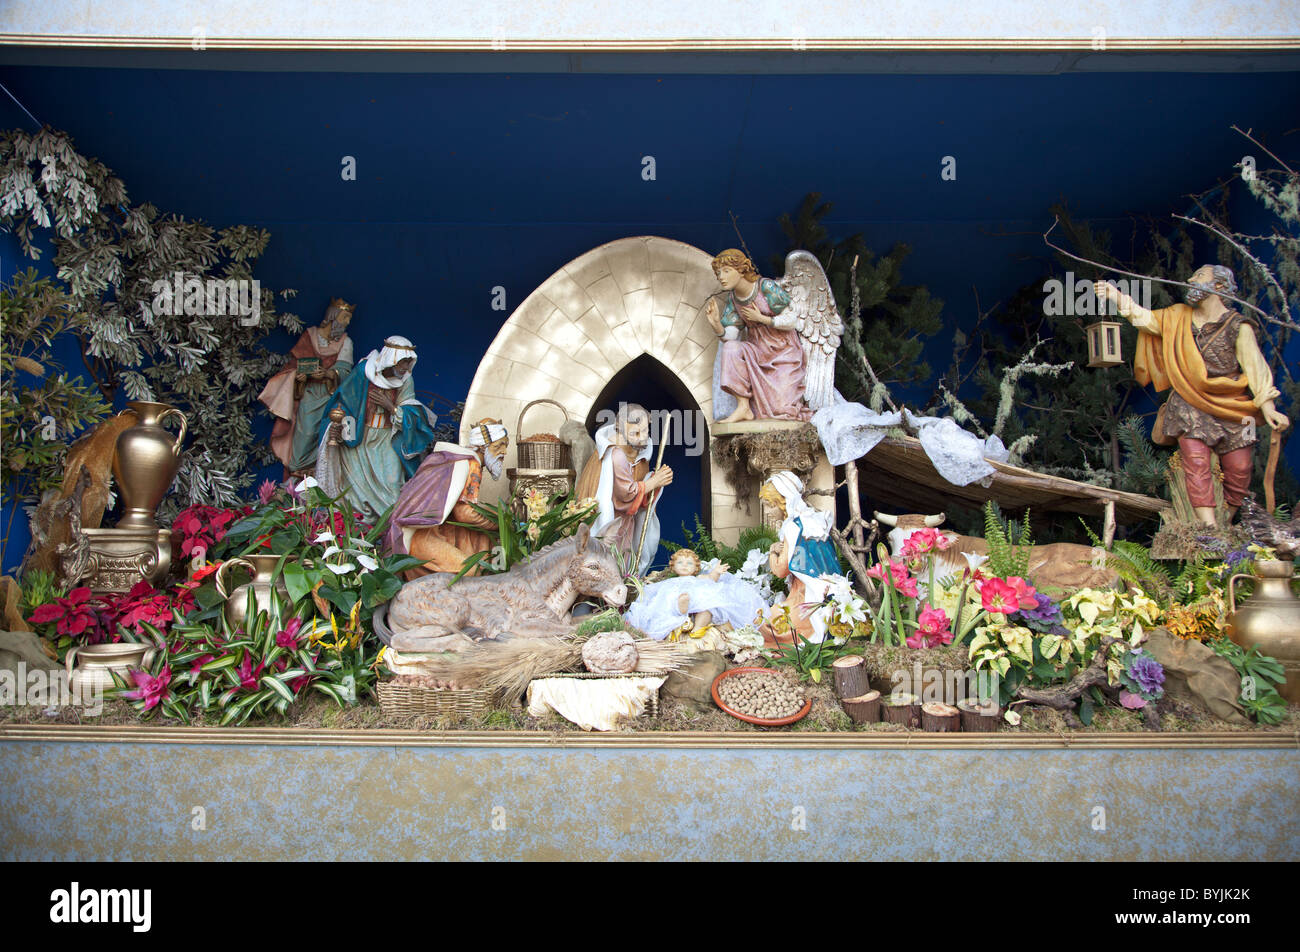 Presepio de Natal at Sao Jorge Madeira - Stock Image